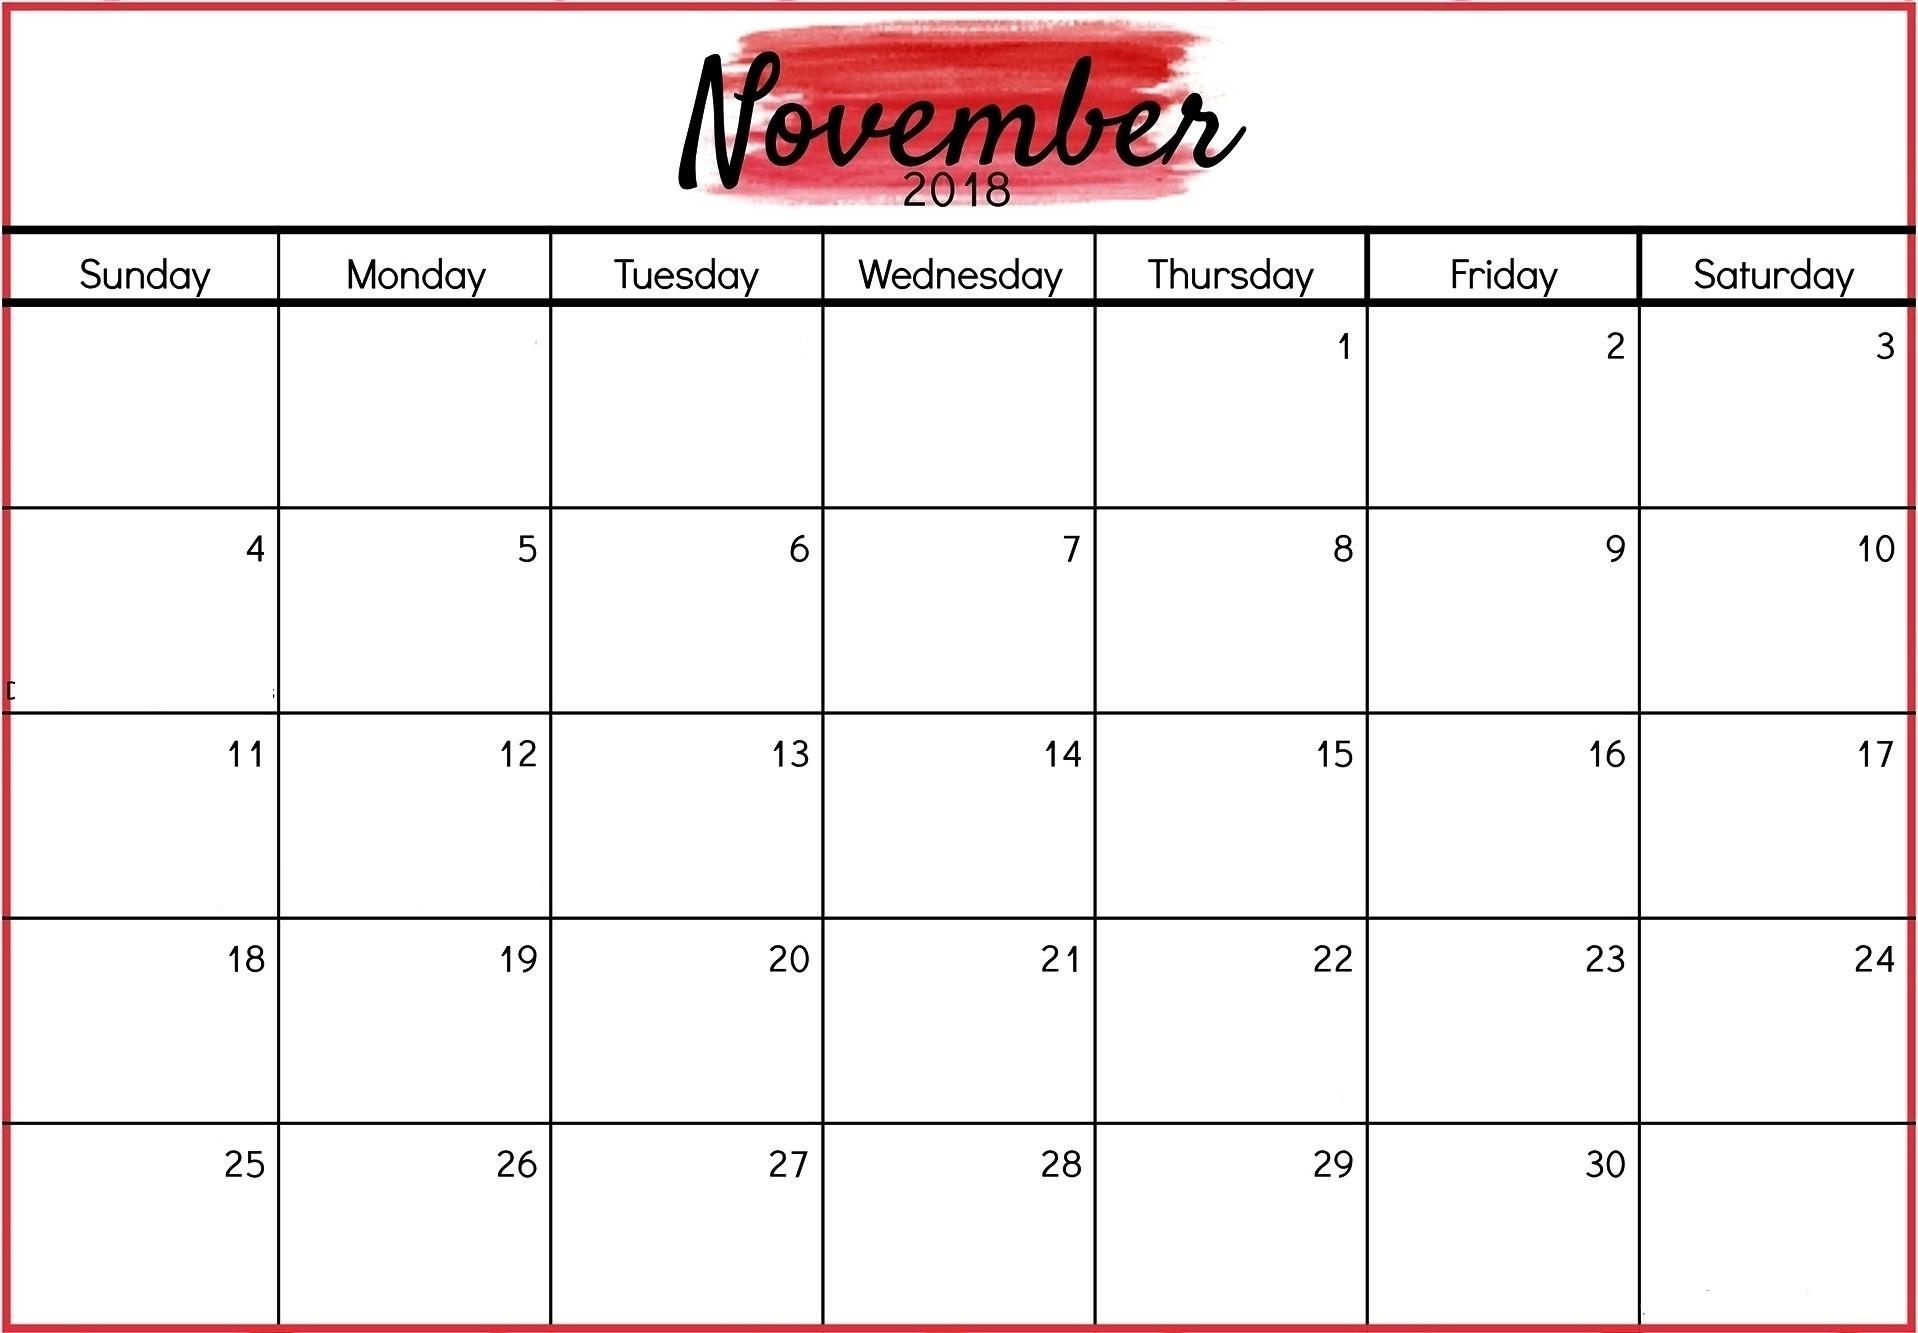 Calendar Template Legal Size – Get Your Calendar Printable